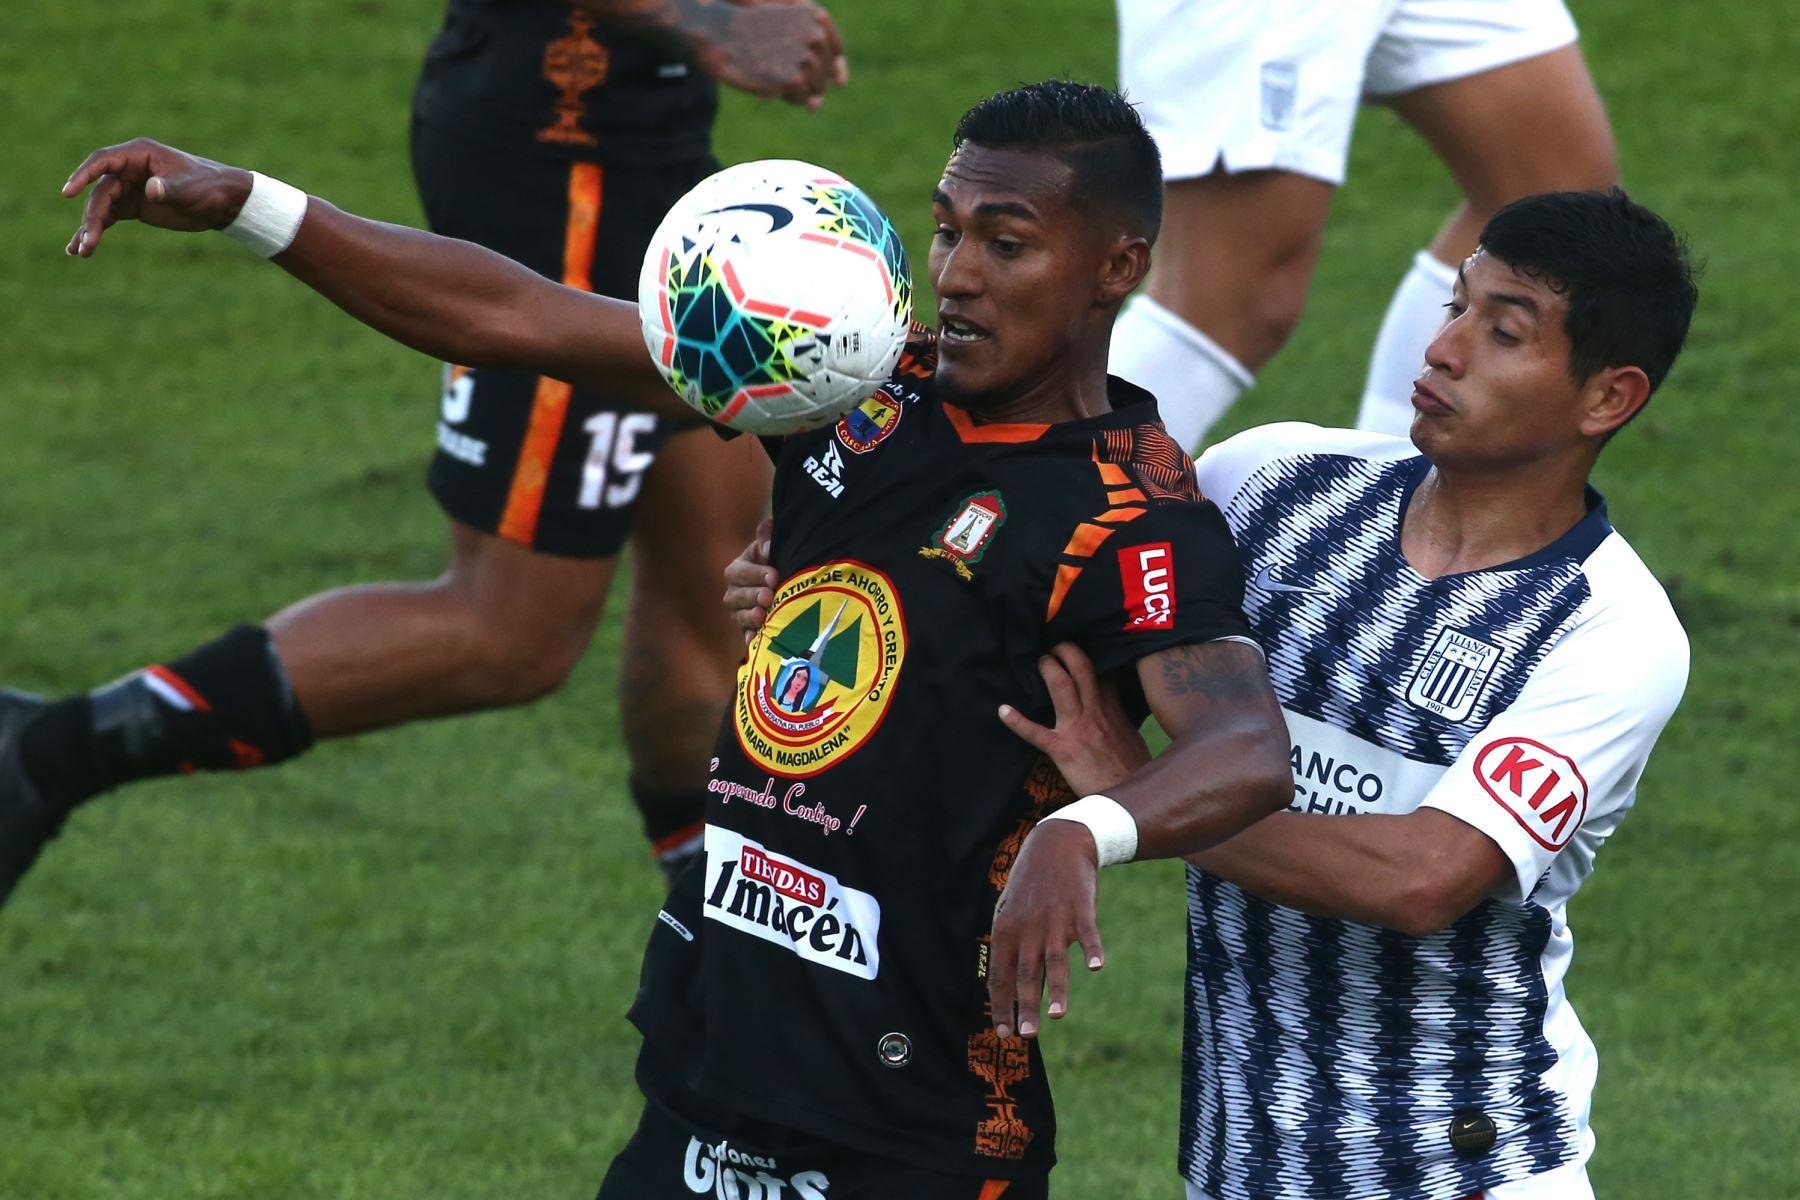 Adrián Balboa de Alianza Lima, Ever chávez de Ayacucho FC por la sexta jornada del Torneo Clausura de la Liga 1. Foto: ANDINA/Vidal Tarqui